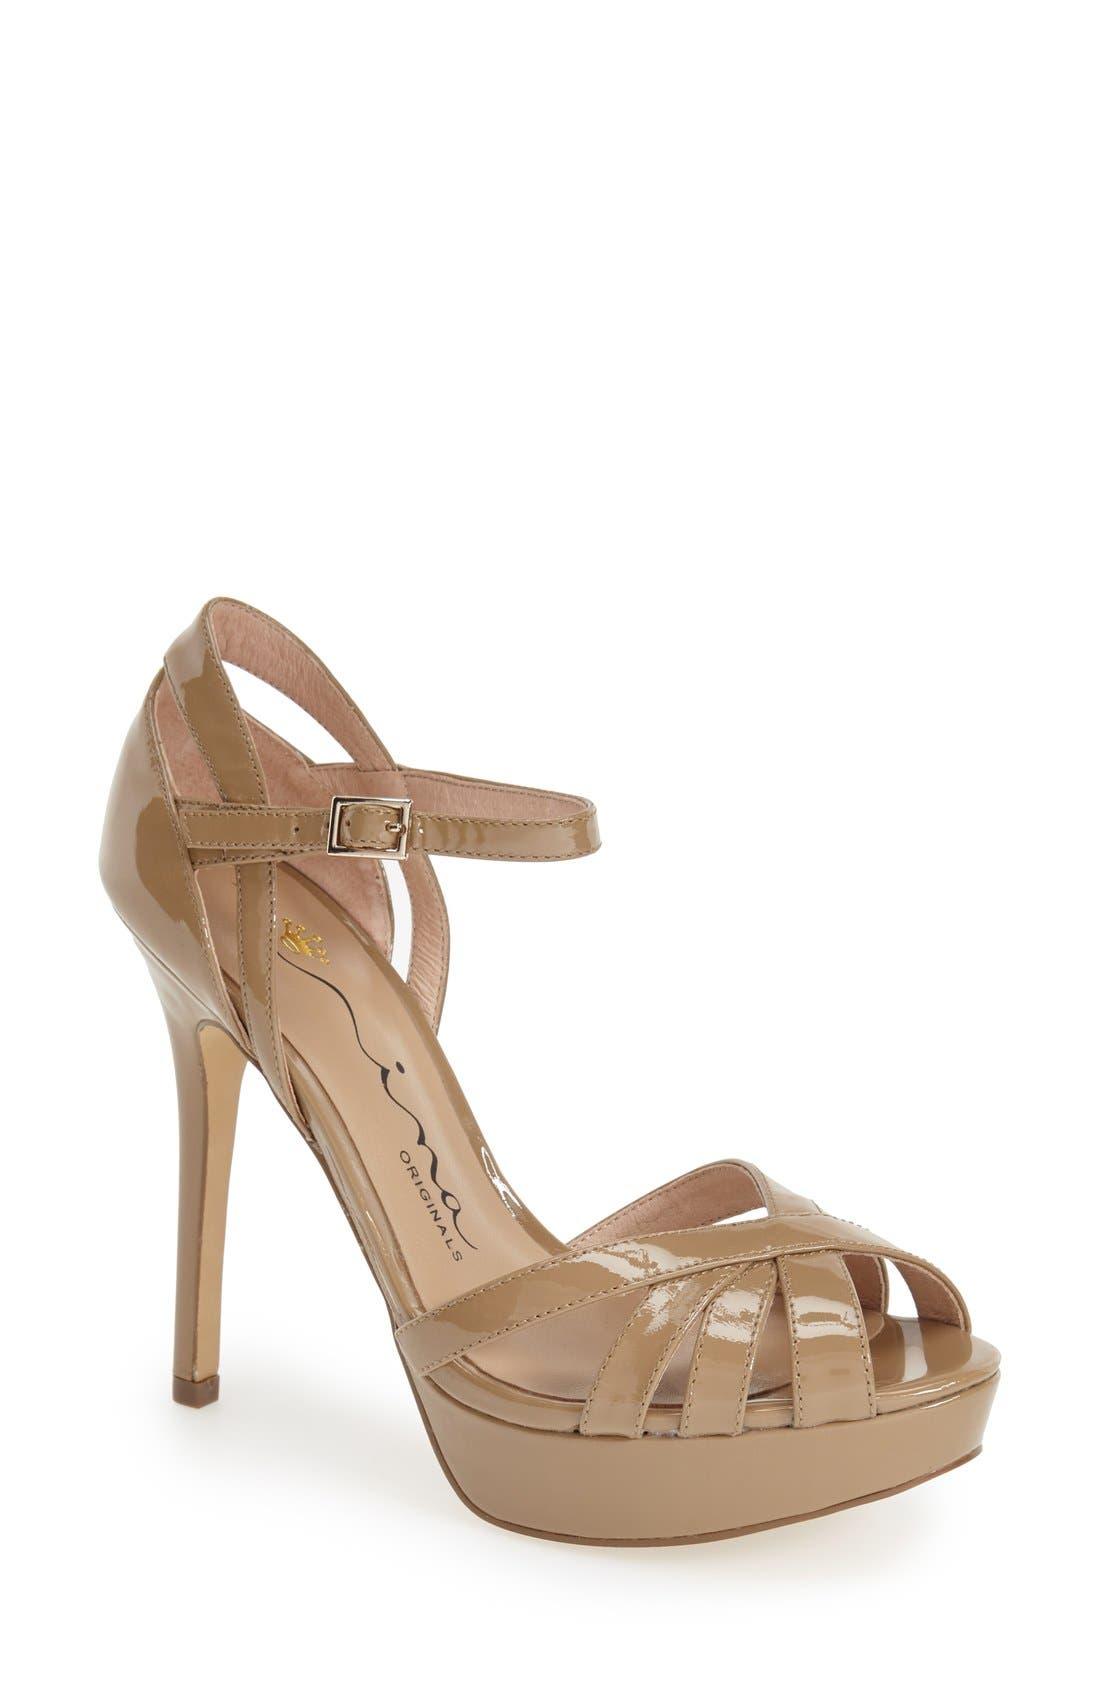 Alternate Image 1 Selected - Nina Originals 'Senora' Ankle Strap Sandal (Women)